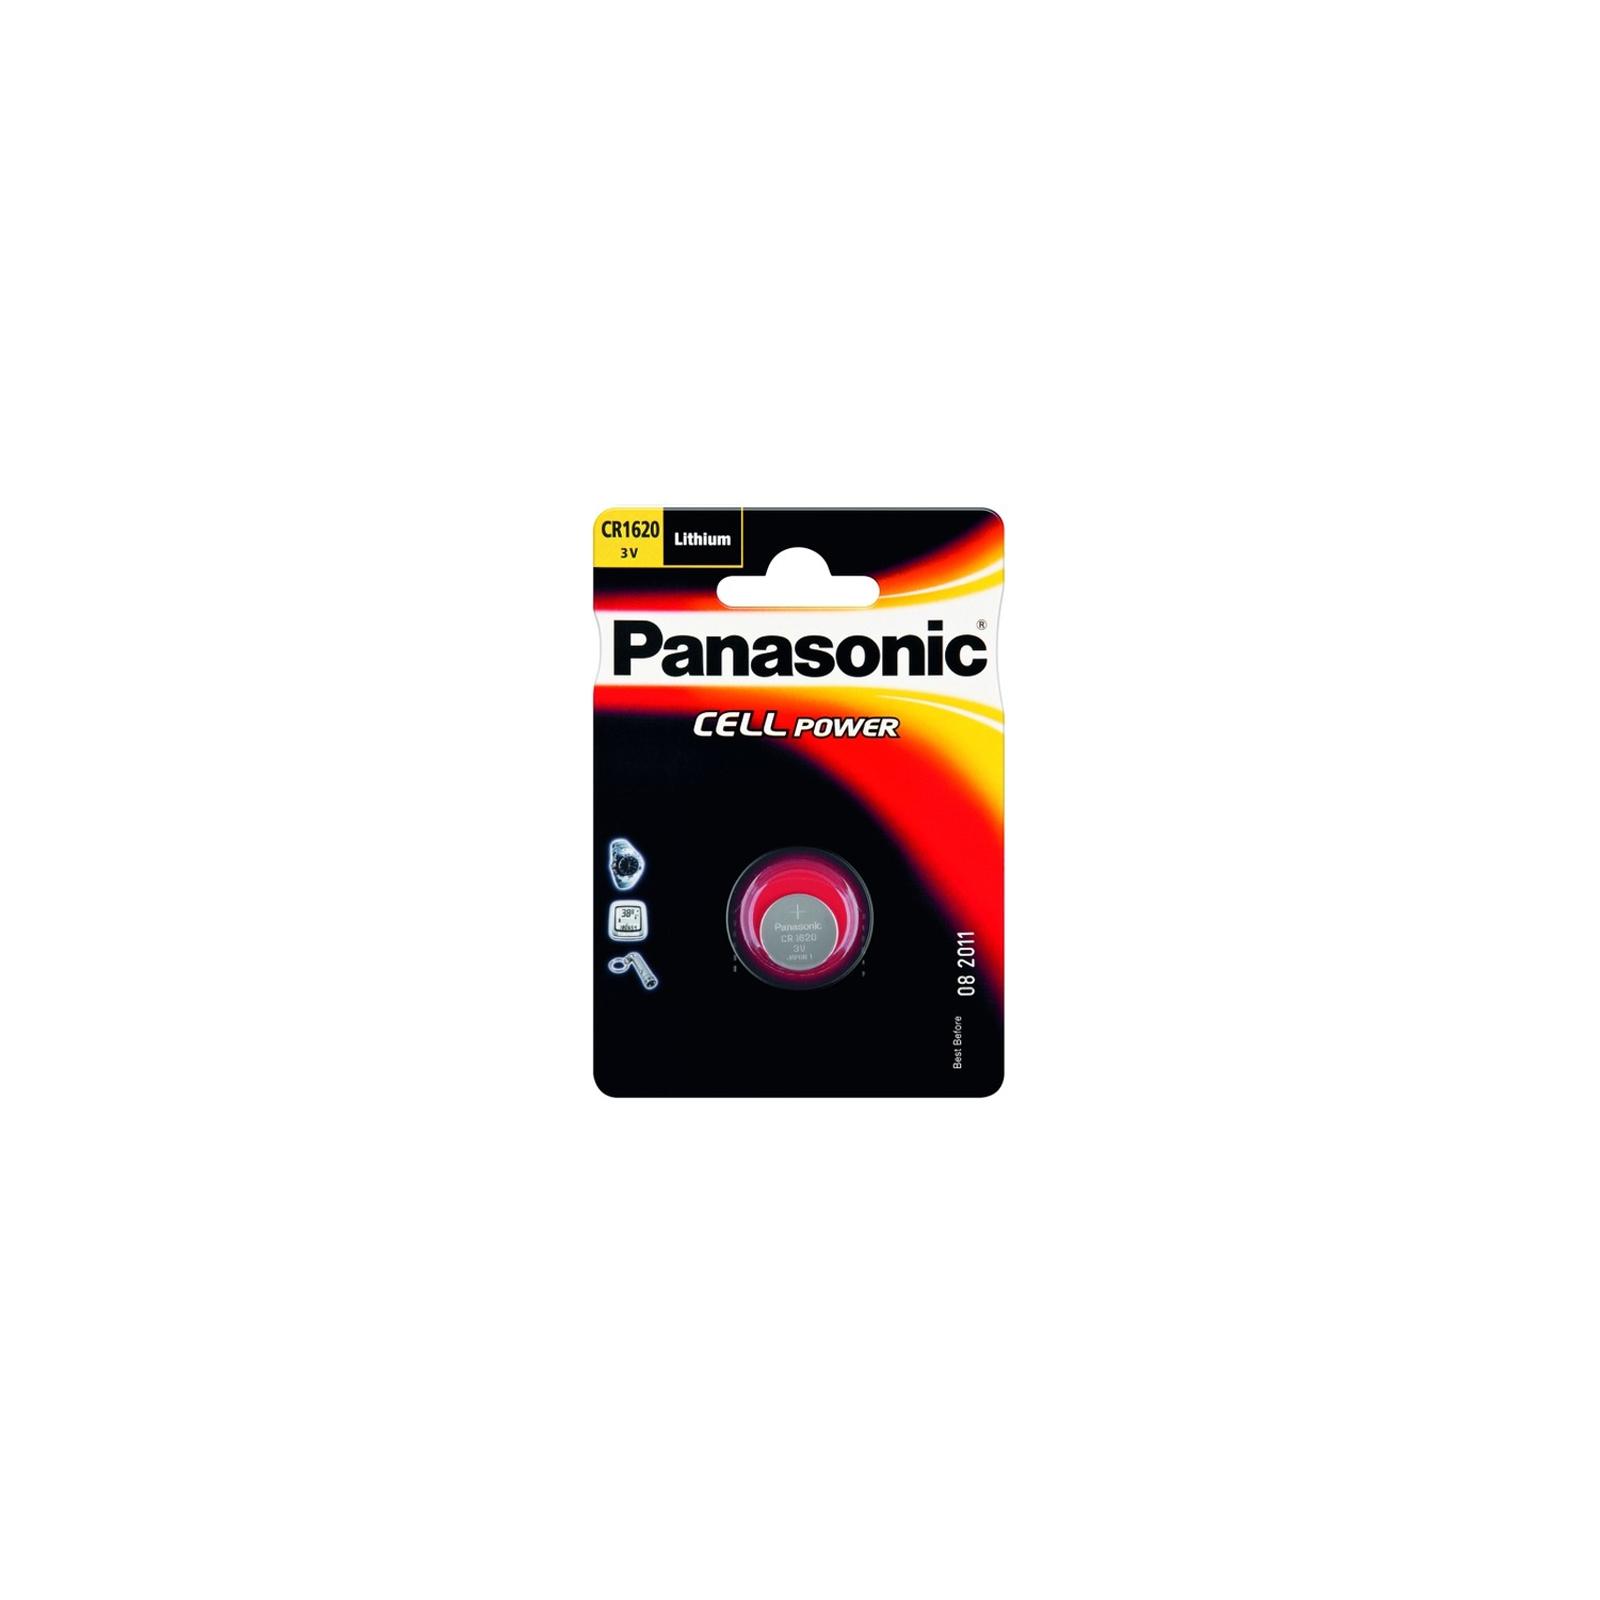 Батарейка PANASONIC CR 1620 * 1 LITHIUM (CR-1620EL/1B)